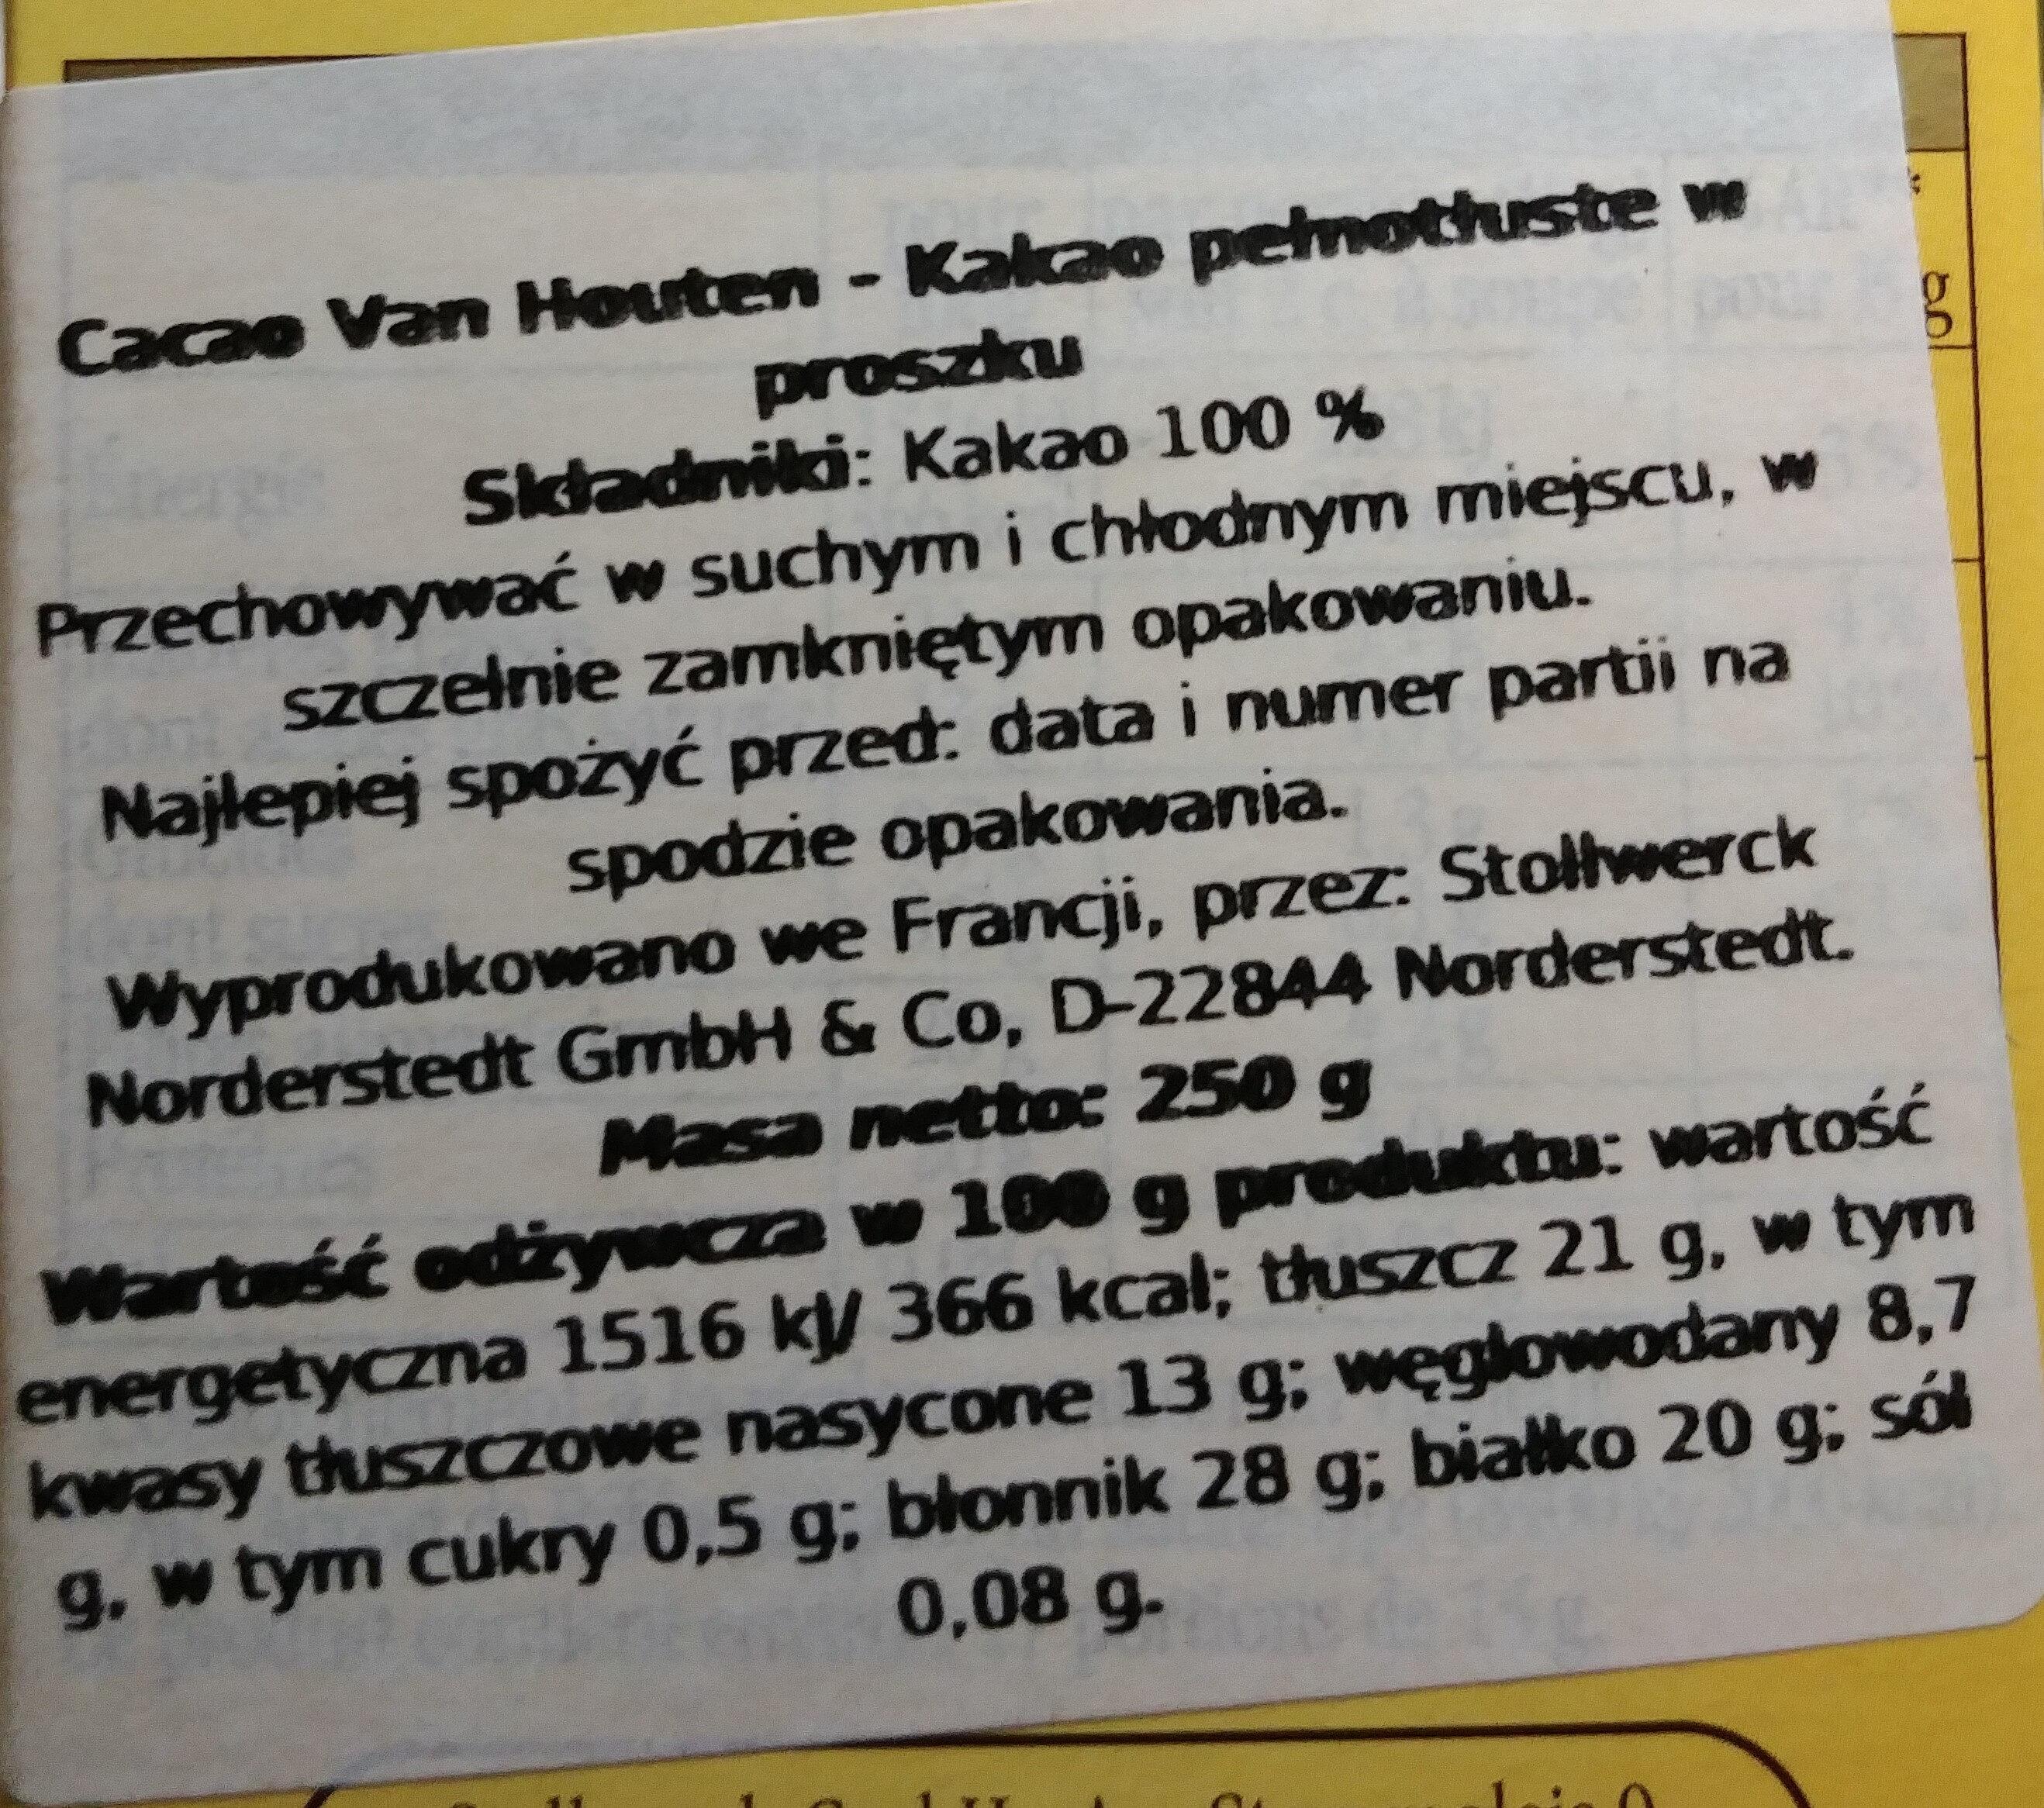 Cacao en poudre non sucré - Wartości odżywcze - pl